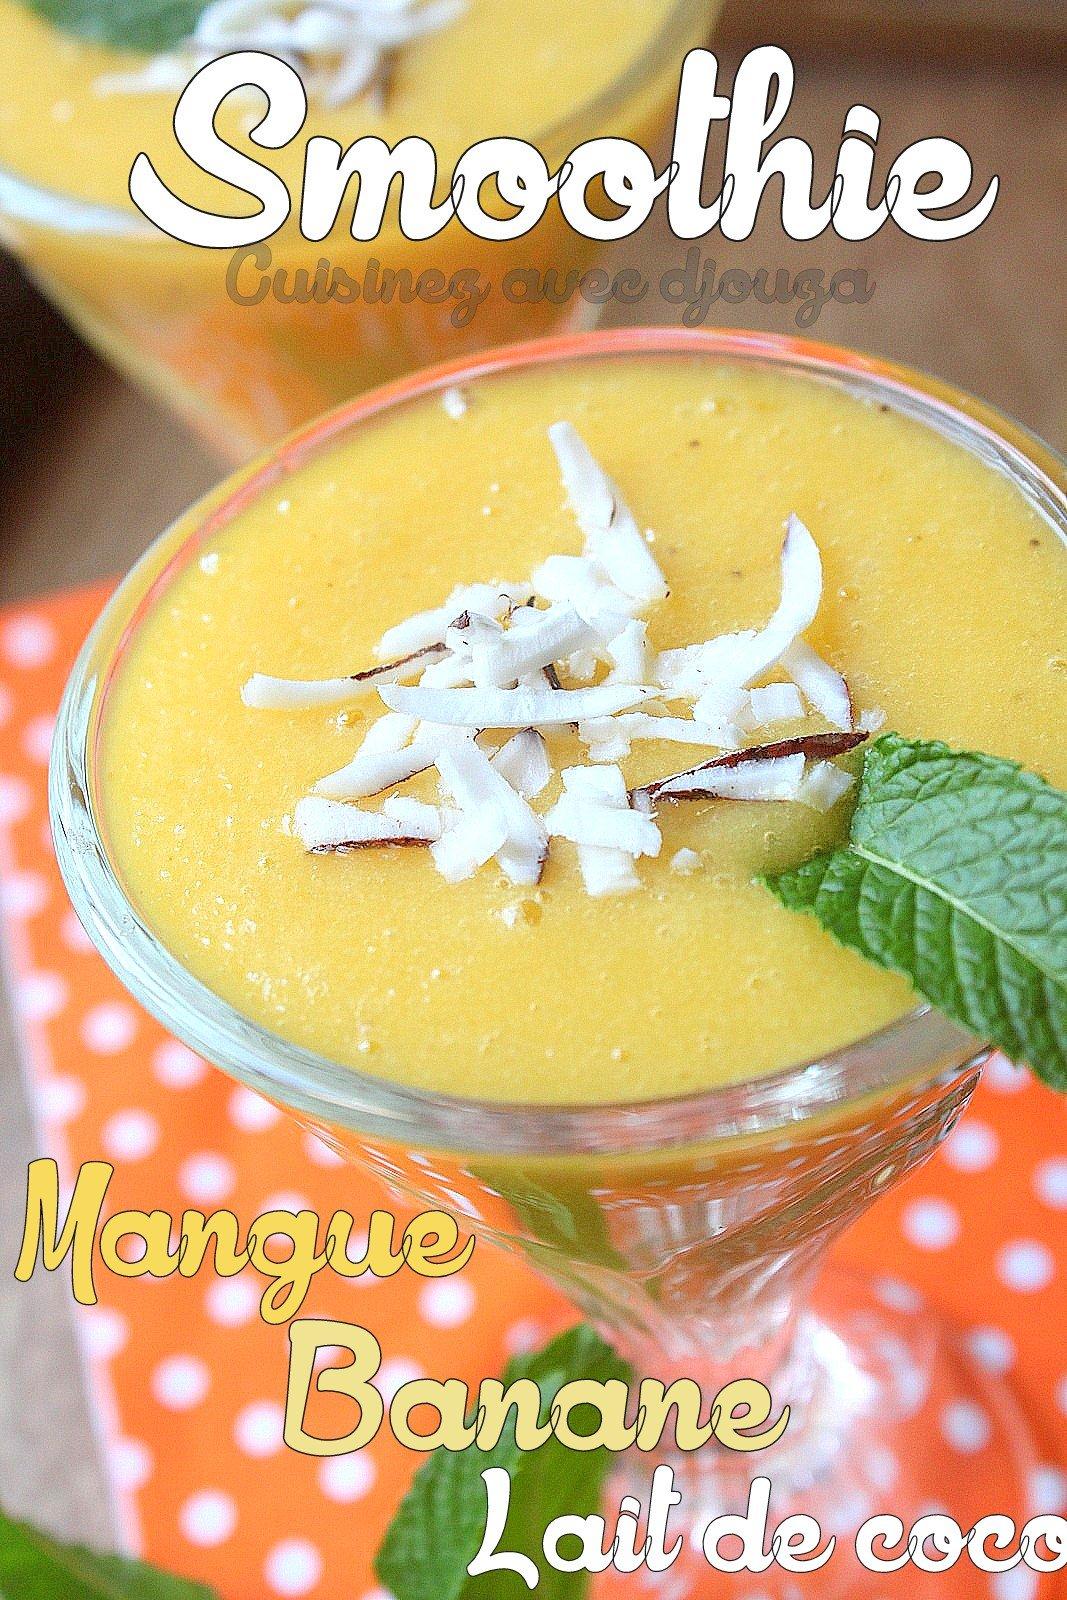 Smoothie mangue banane